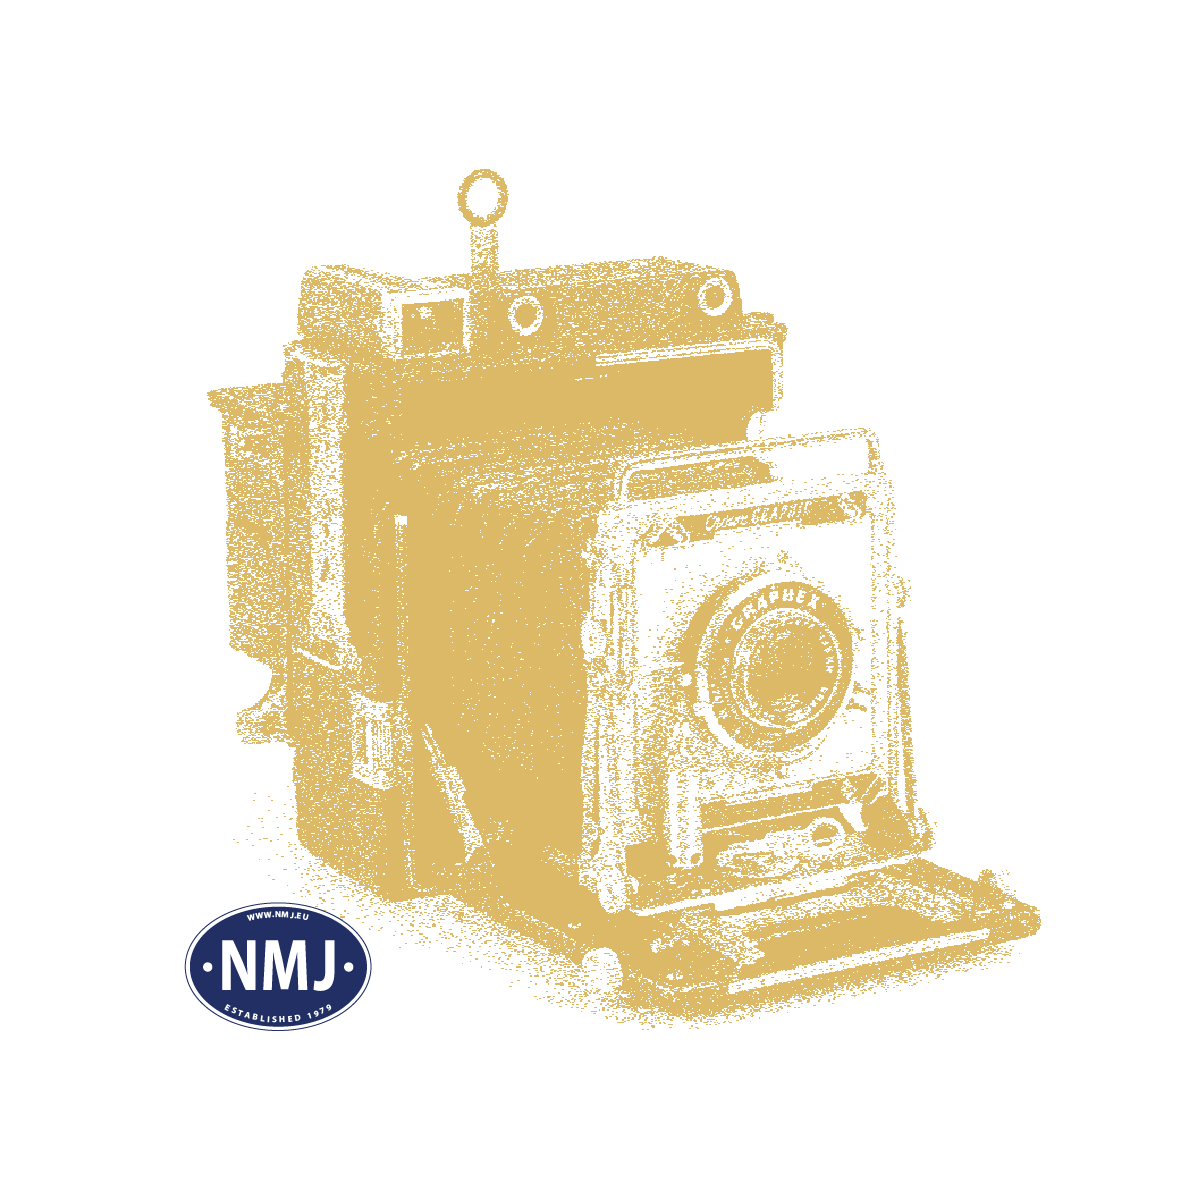 NMJT203.002 - NMJ Topline AB3K 4864, 1/2 Kl Personenwagen, mit altem SJ Logo